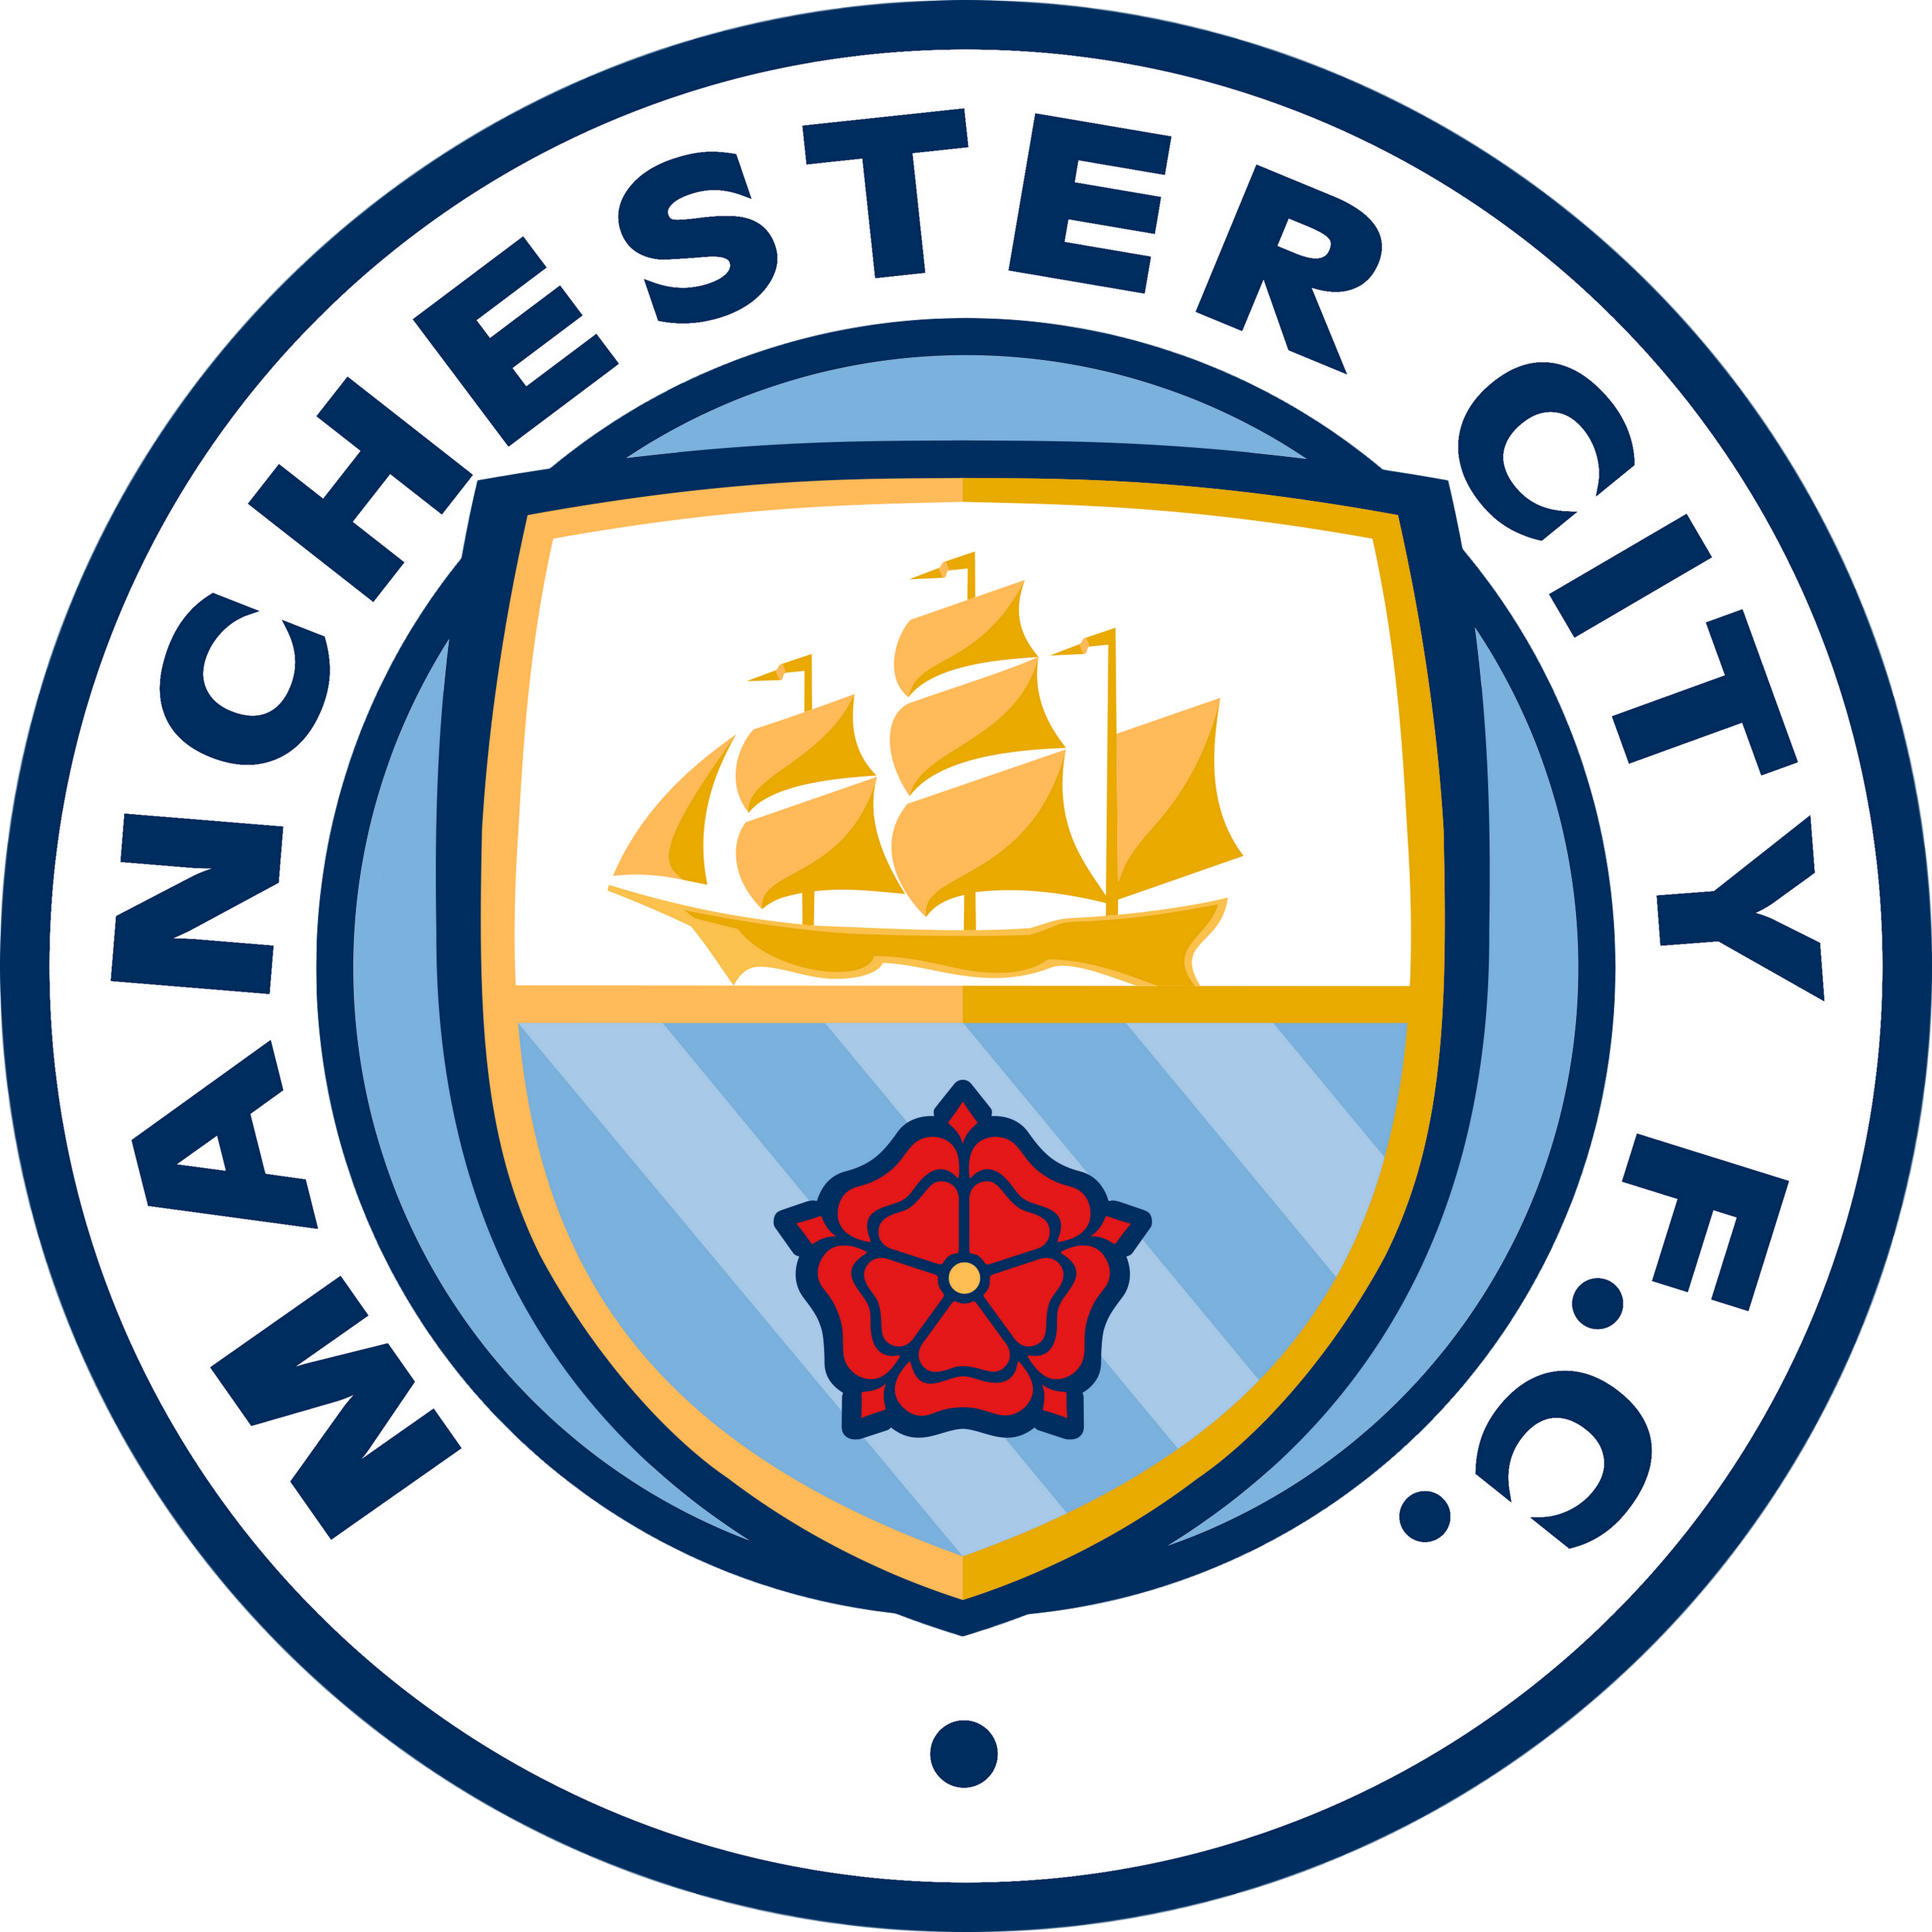 2017 Man City Logo Png Images.